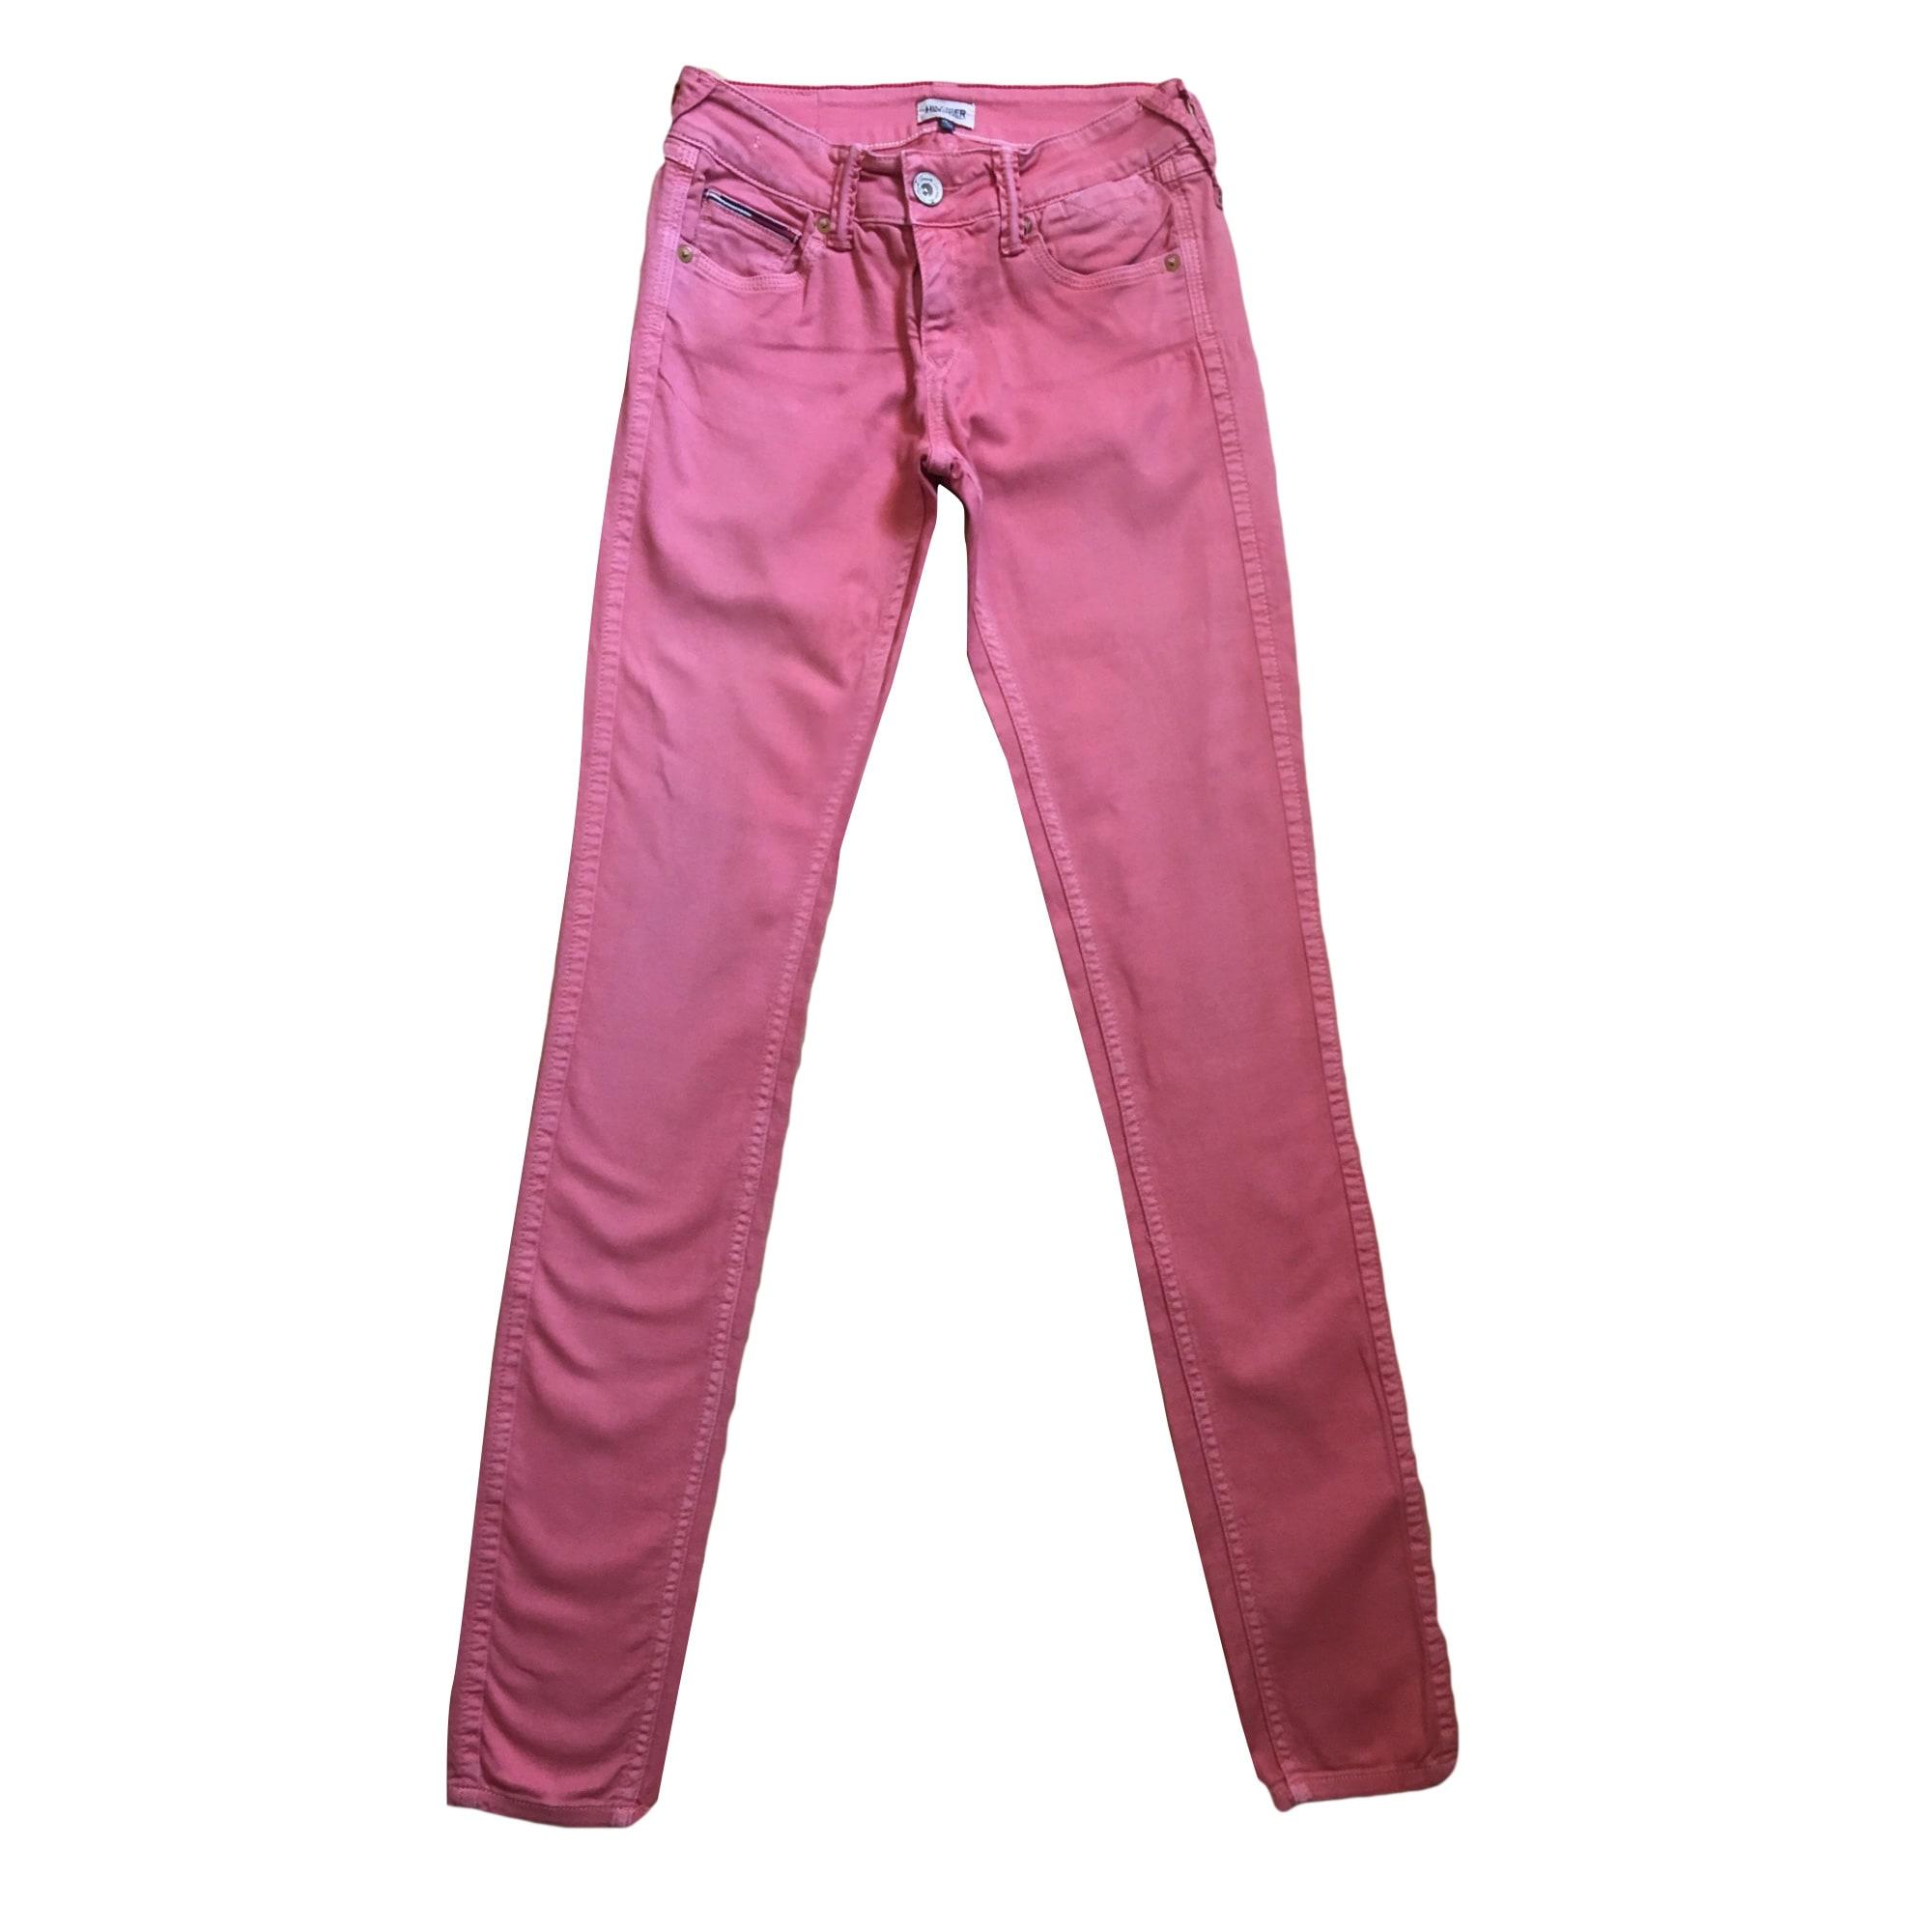 Jeans slim TOMMY HILFIGER Rose, fuschia, vieux rose